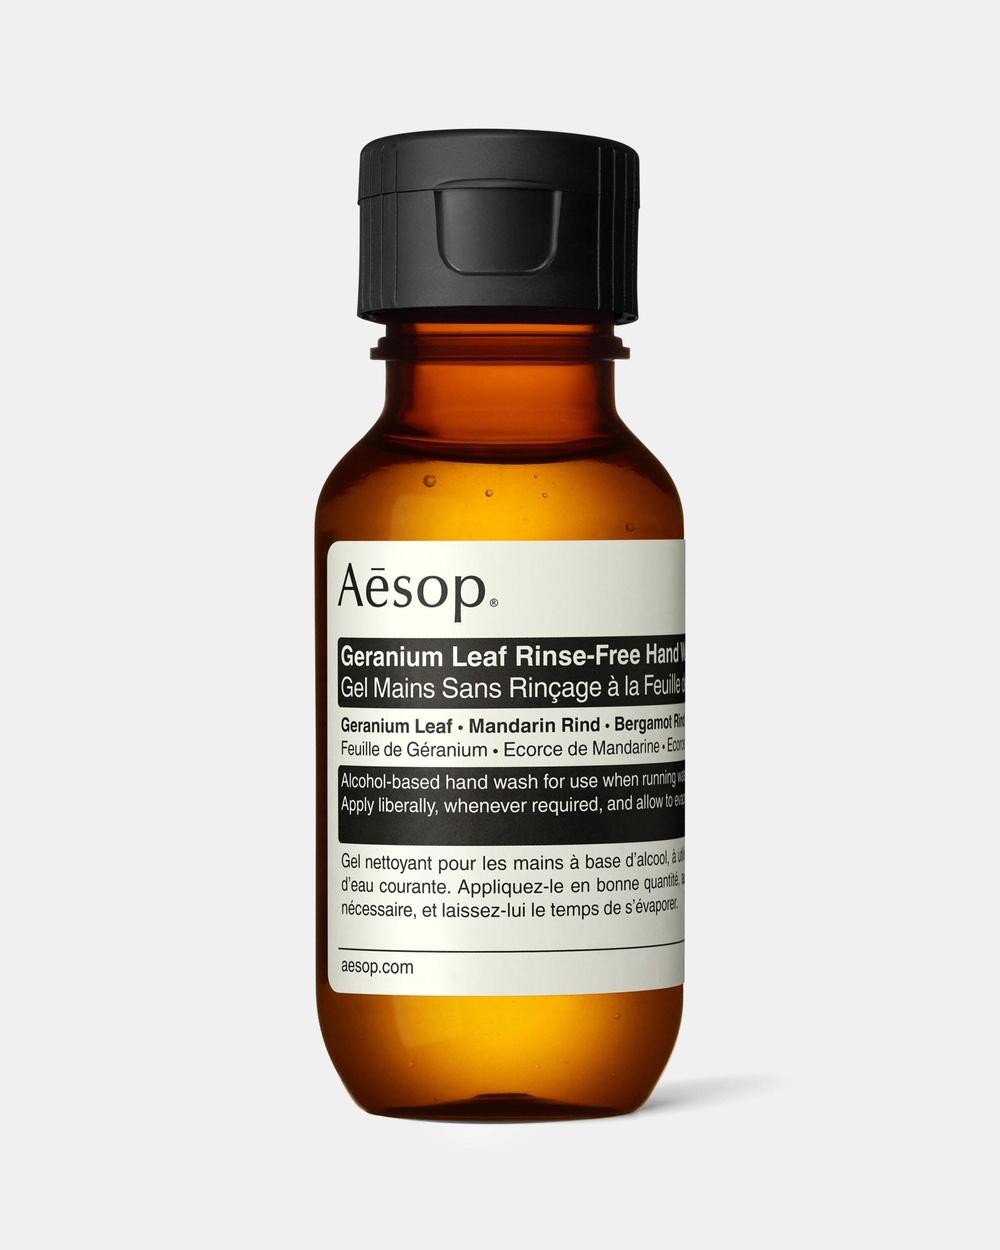 Aesop Geranium Leaf Rinse Free Hand Wash 50mL Beauty 50mL Rinse-Free